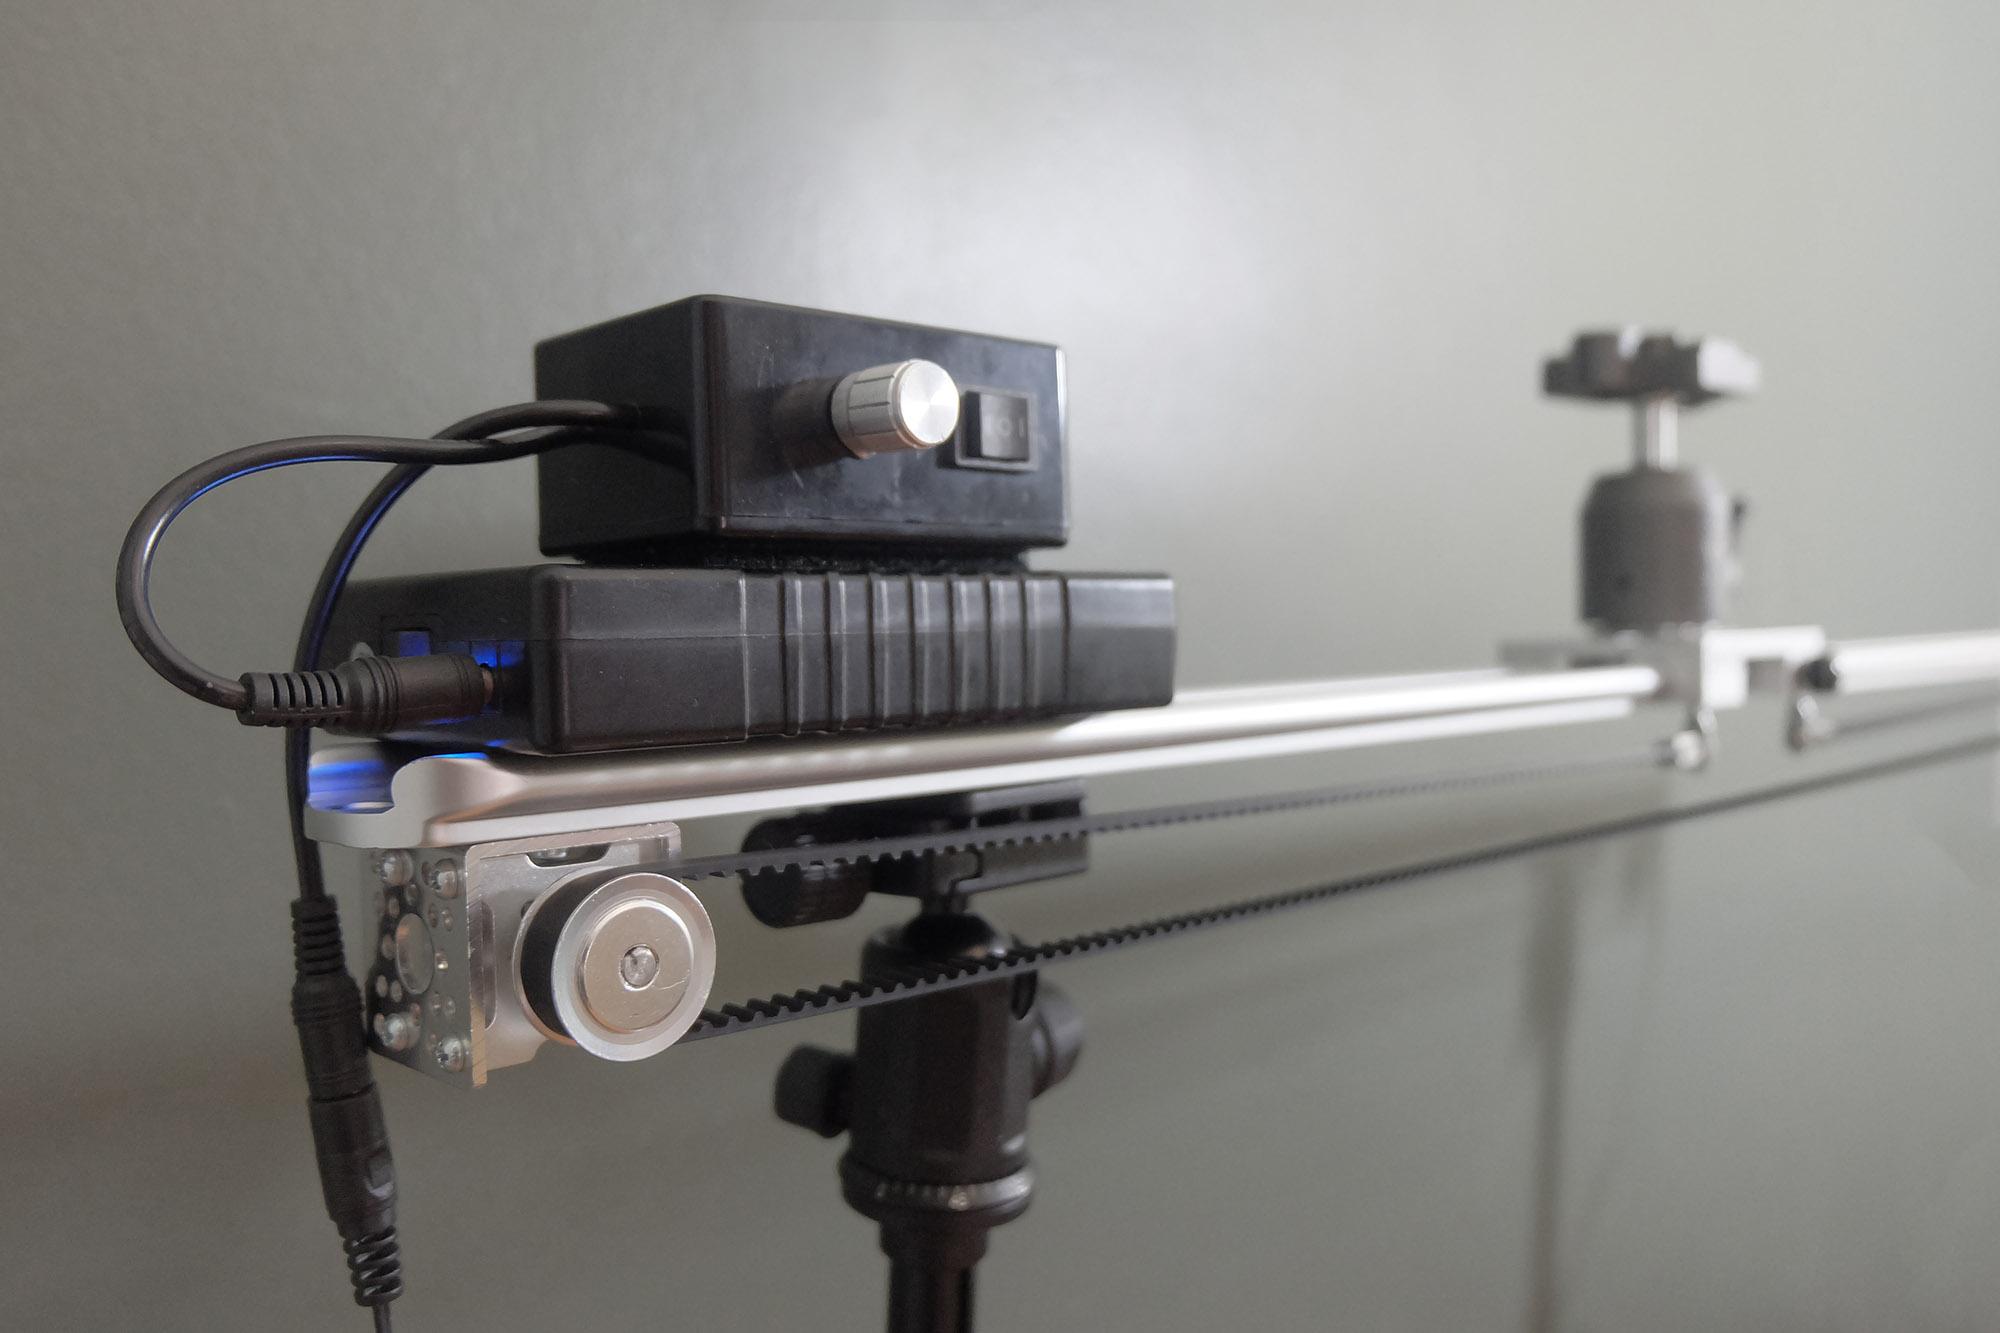 midwest-lenticular-printing-slider-c